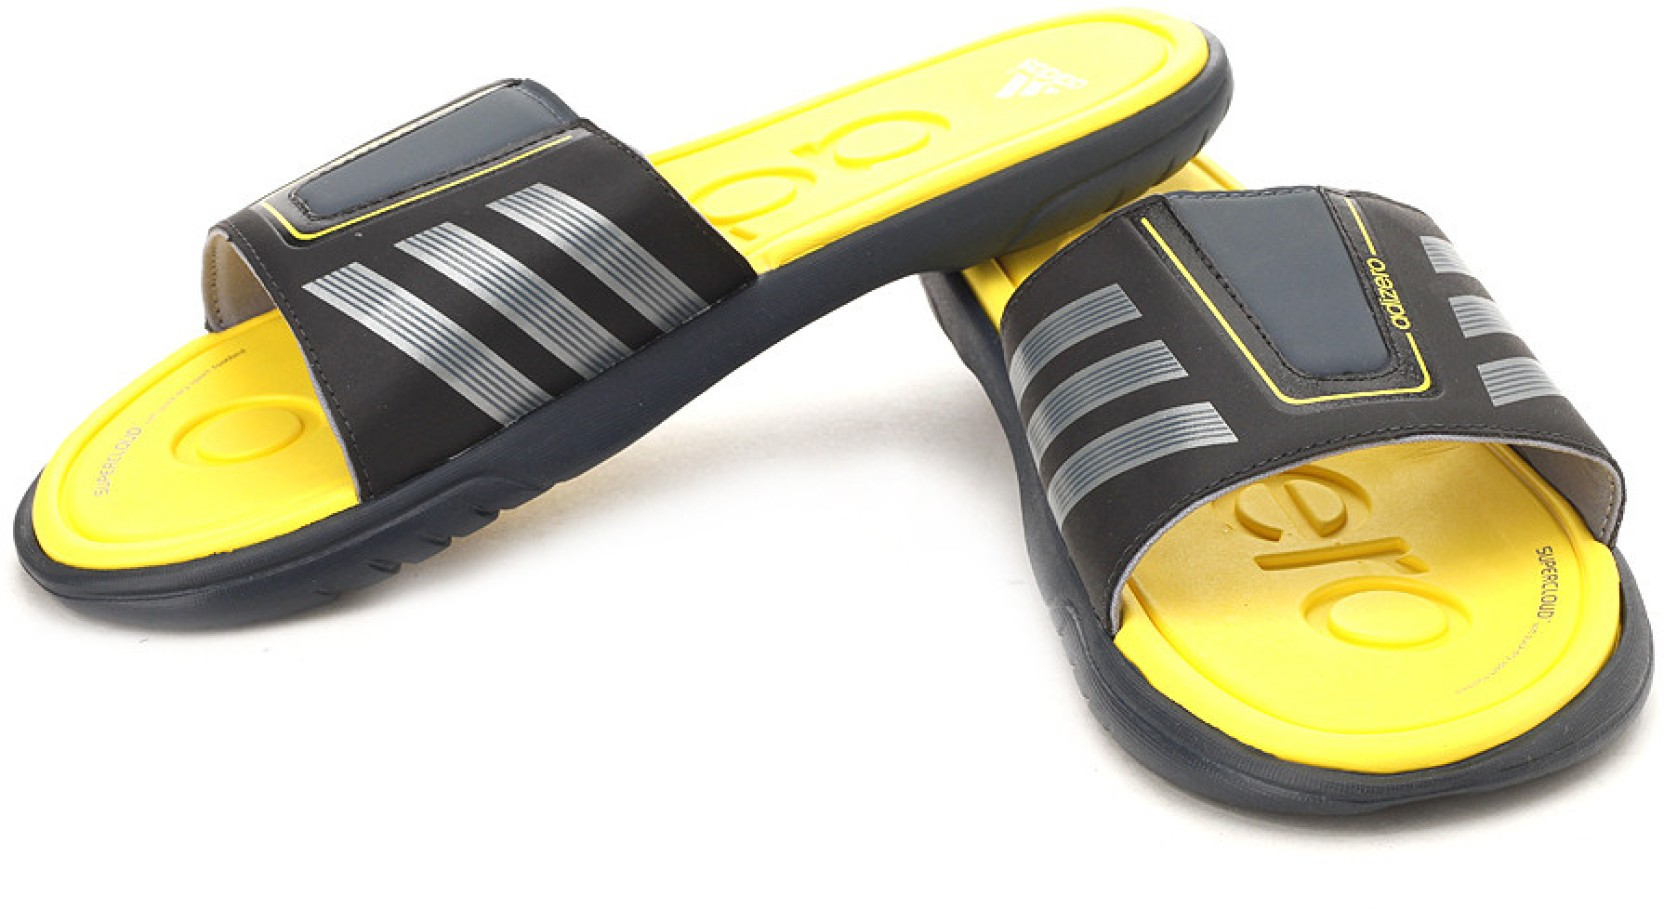 48b9dc5d3ab3 ADIDAS Adizero Slide 3 SC Slippers - Buy Dark Grey